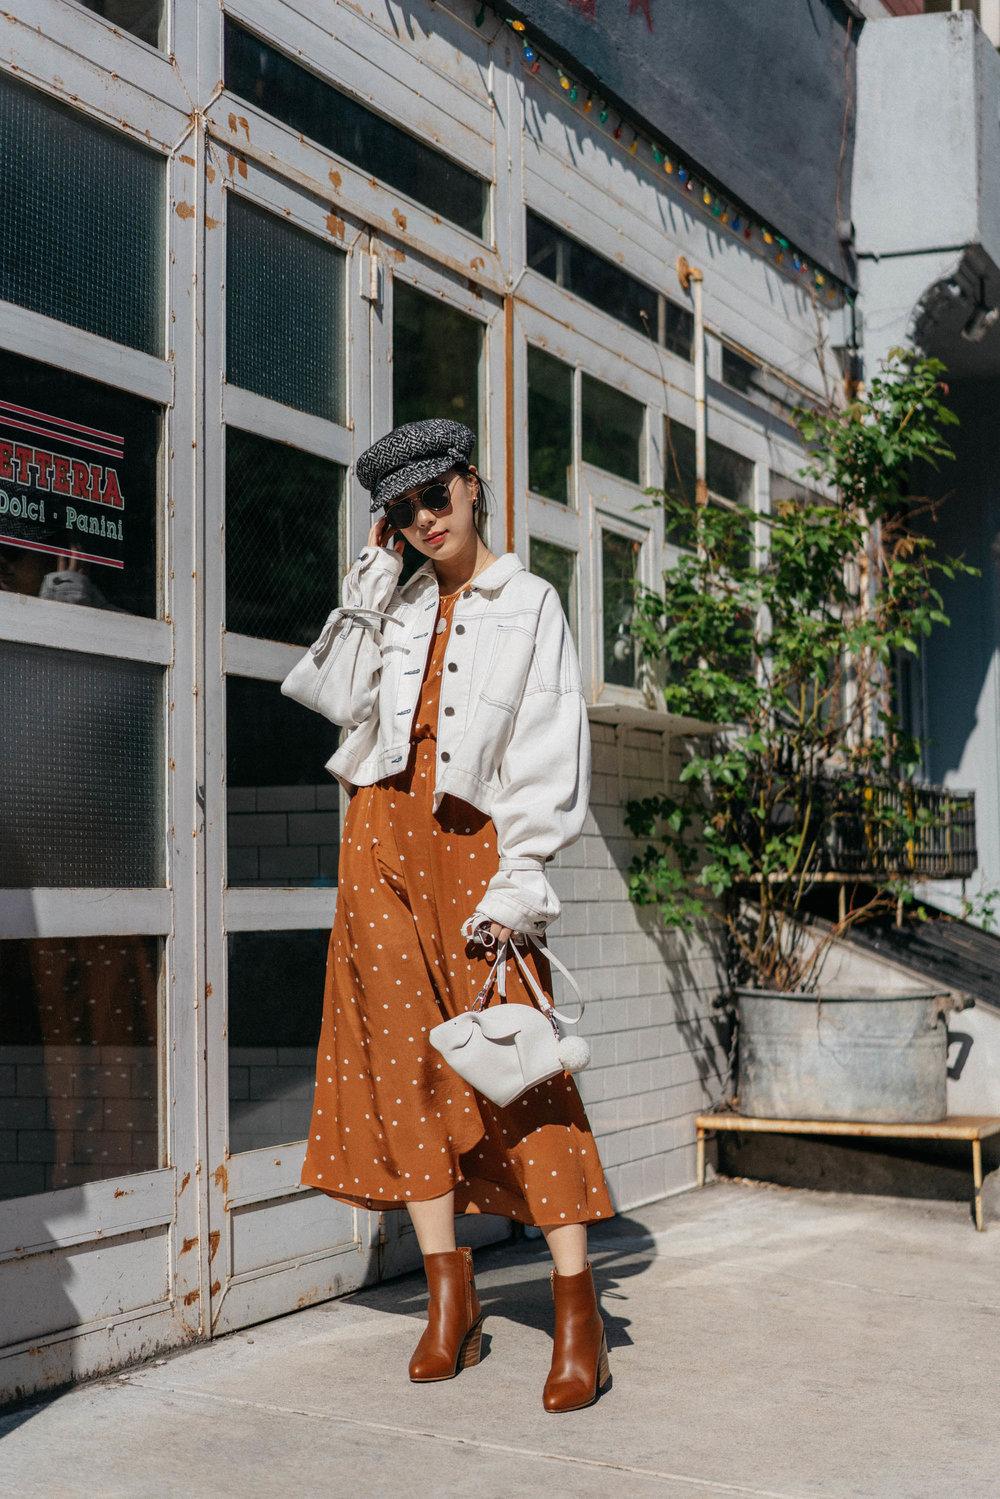 Sezane Dress , Gabriela Hearst Boots,  Loewe Bag , Eugenia Kim Hat,  CVC Stones Necklace ,  Eyevan 7285 Sunglasses ,  Donni Charm Scrunchie